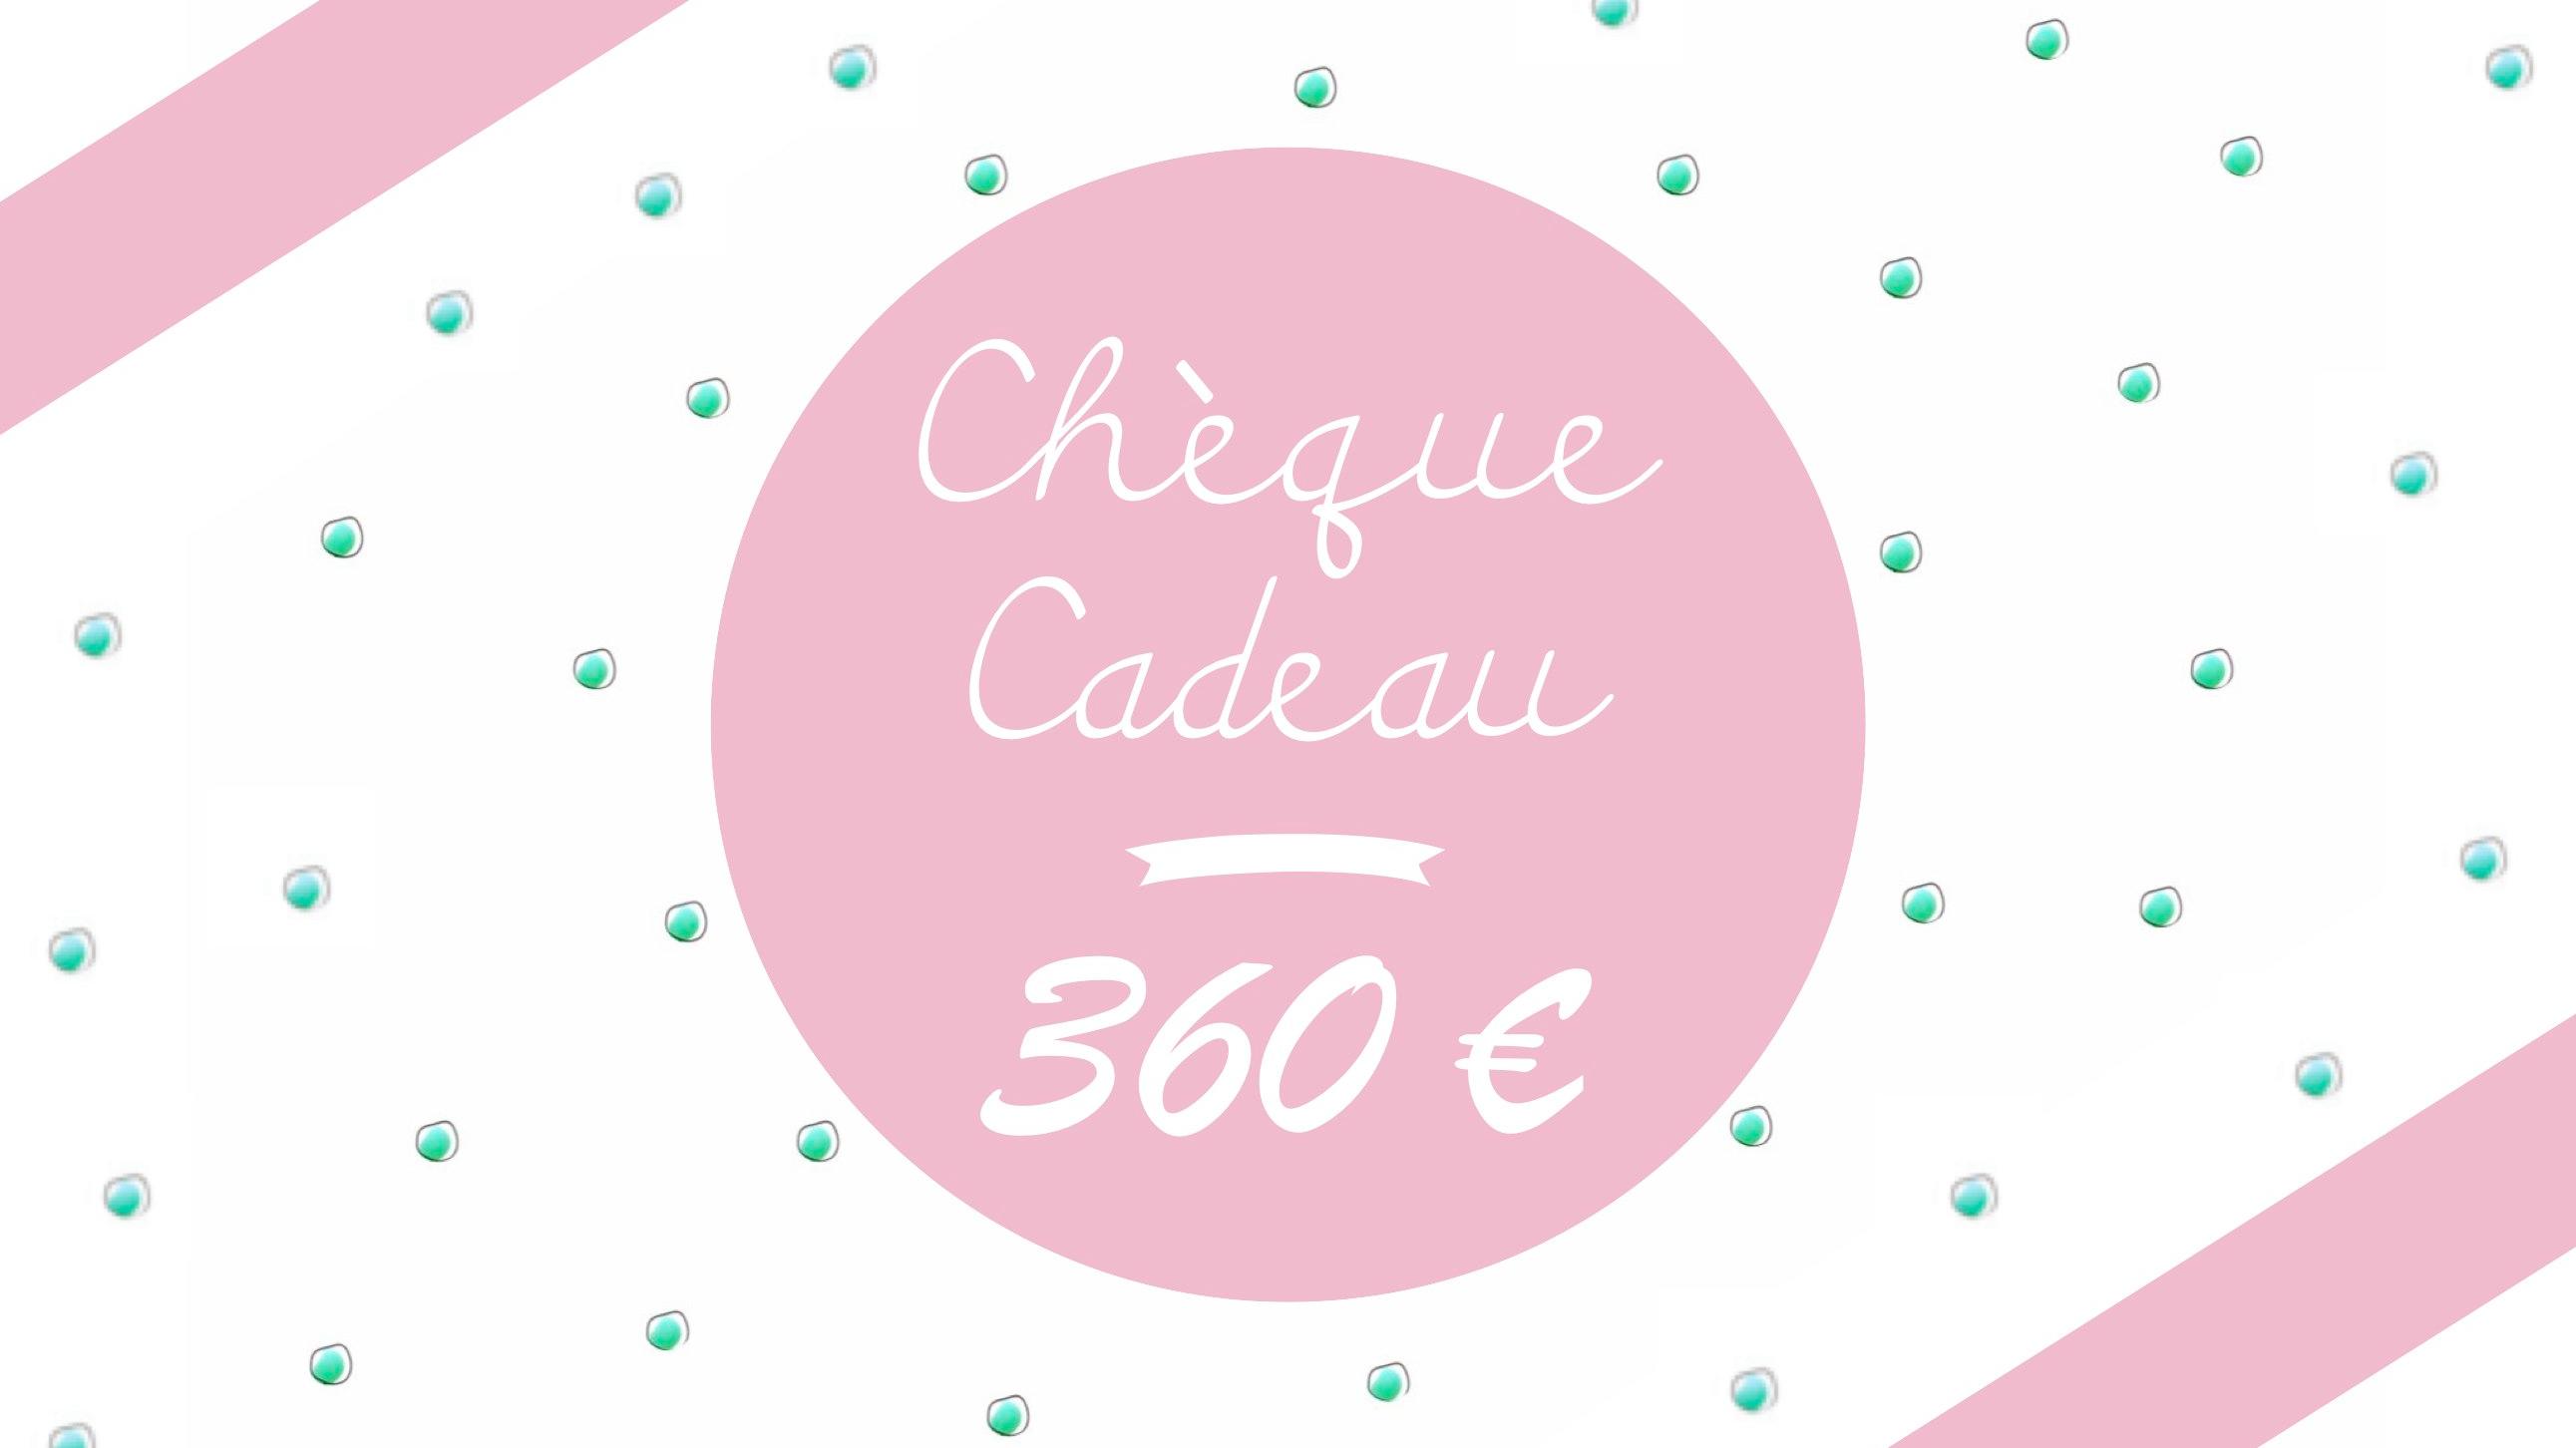 visuel_cheque360-1523546262.jpeg